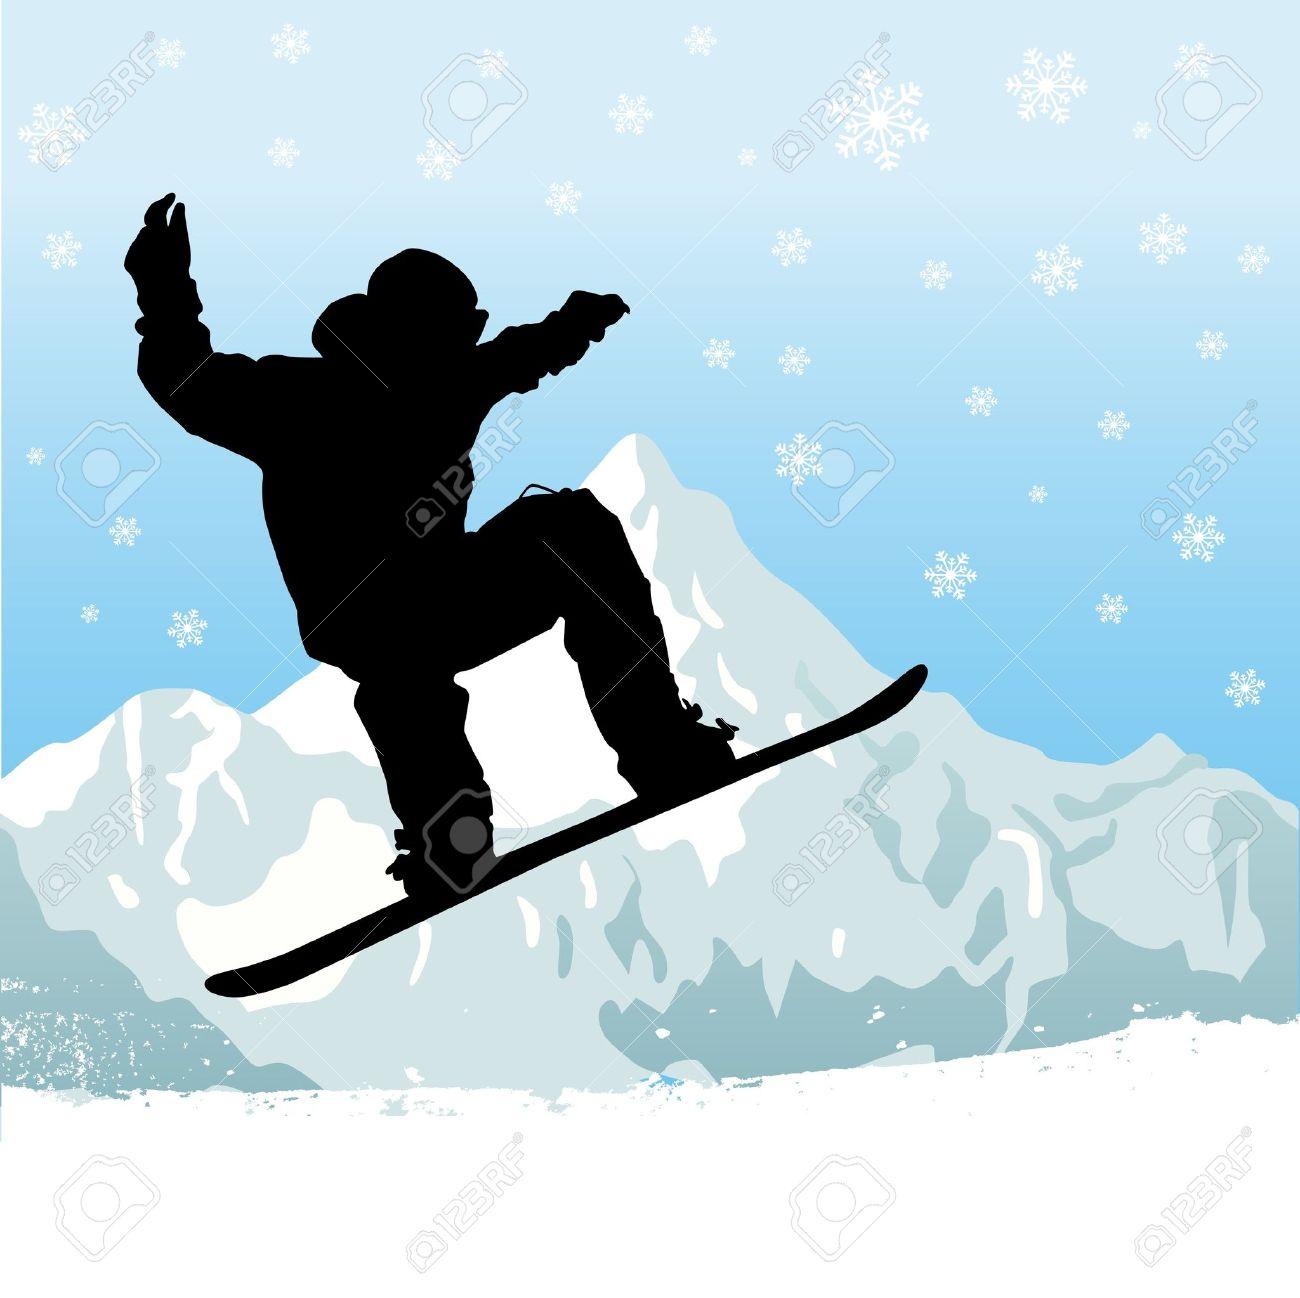 snowboarding royalty free cliparts vectors and stock illustration rh 123rf com snowboarding goggles clipart girl snowboarding clipart